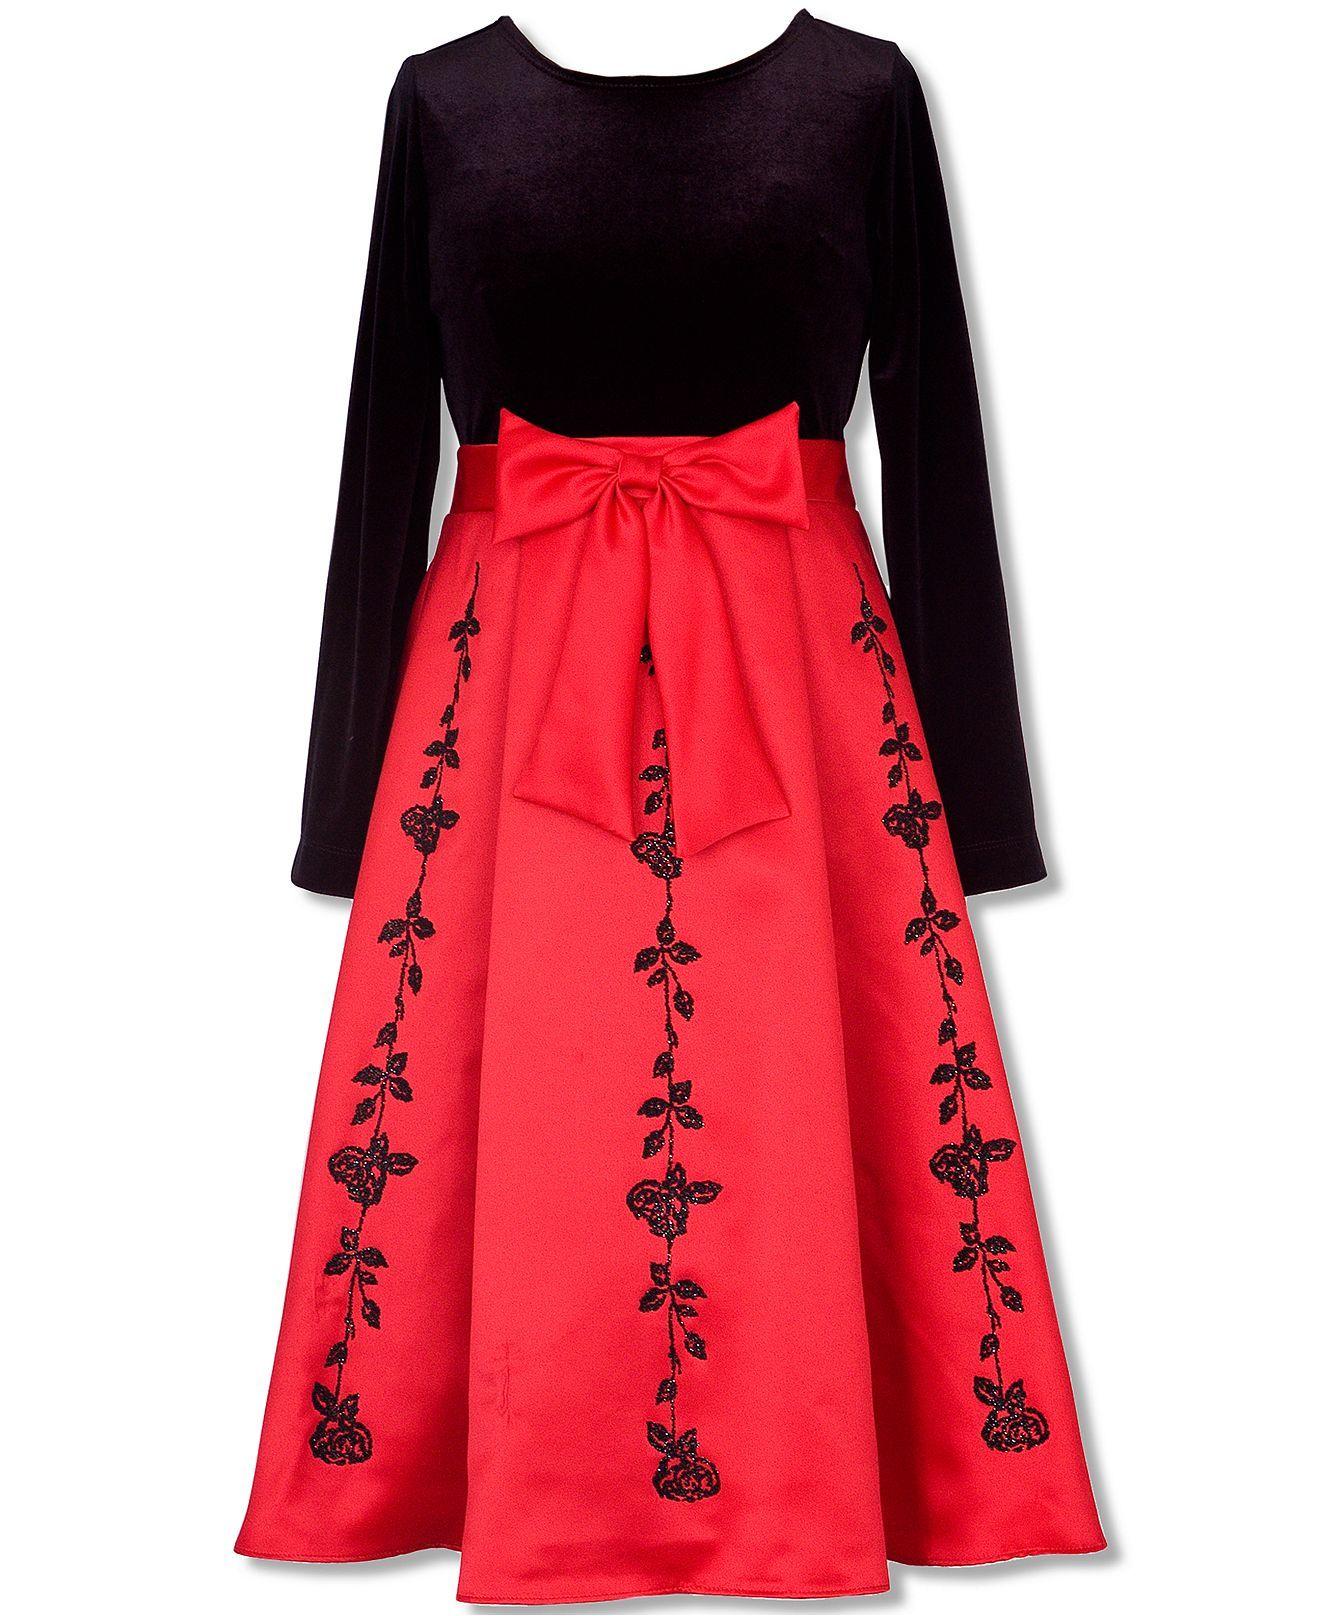 Rare Editions Christmas Dresses.Rare Editions Kids Dress Girls Velvet Holiday Dress Kids